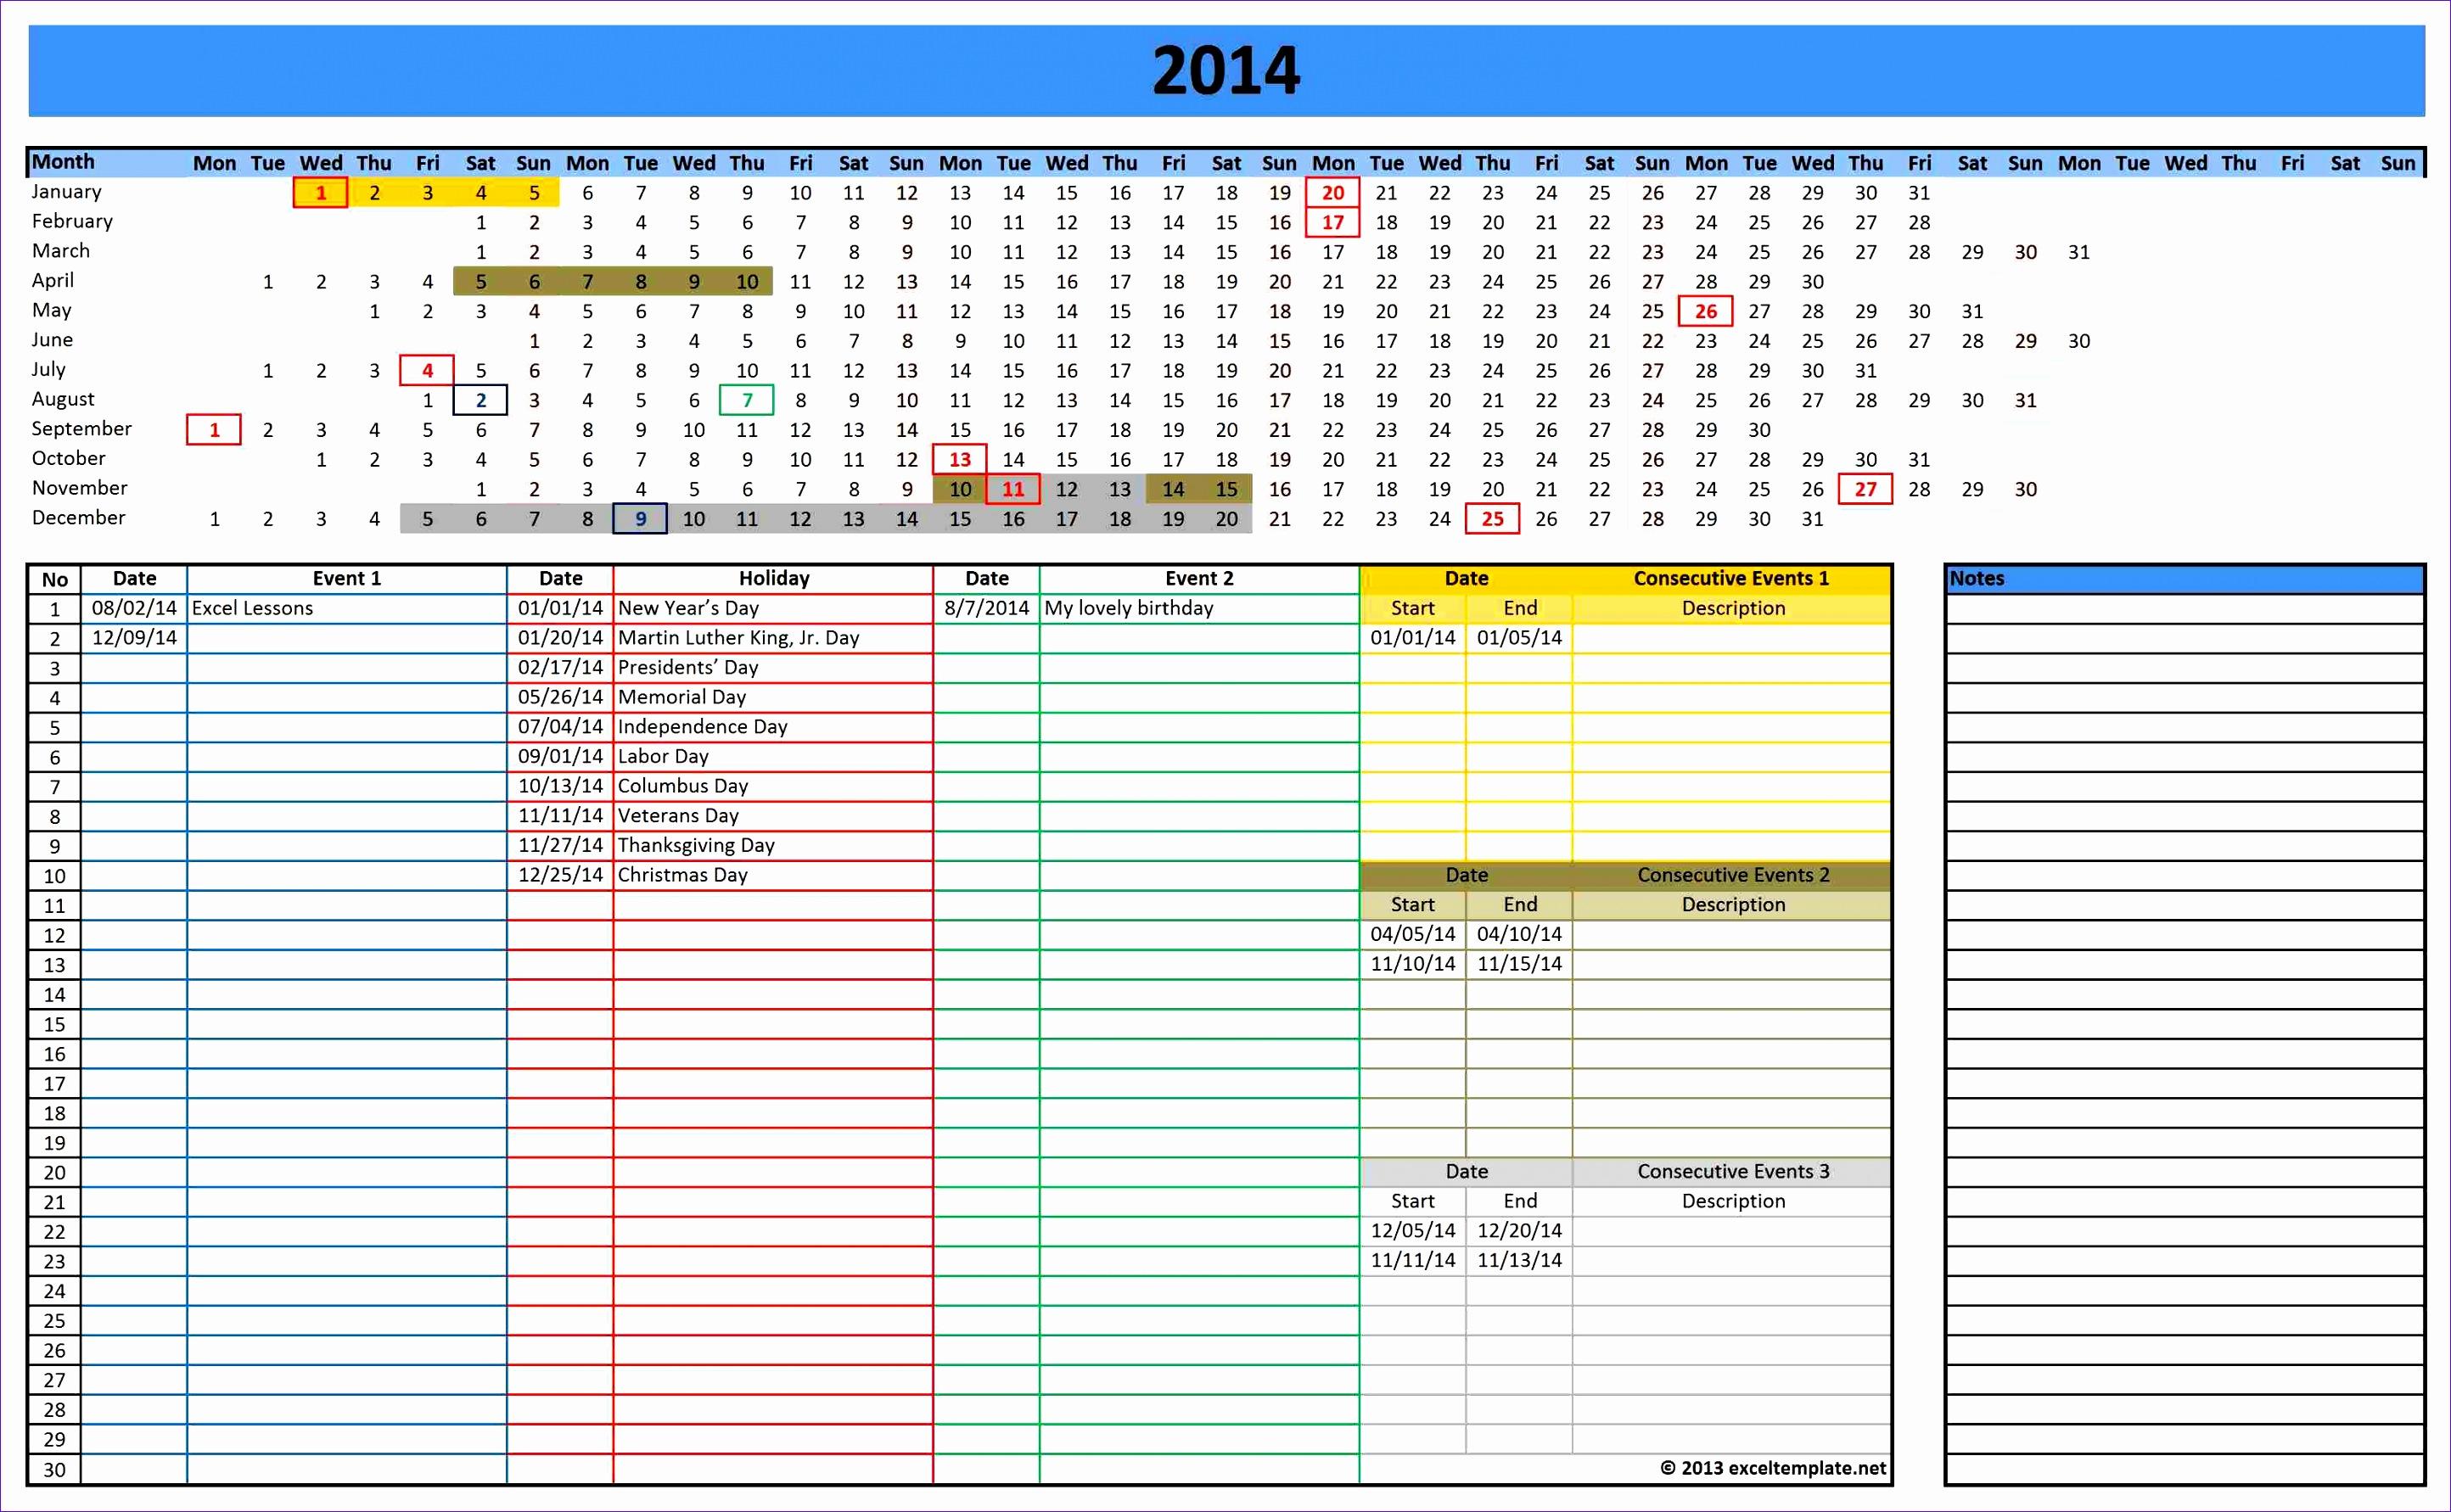 10 Staff Rota Template Excel